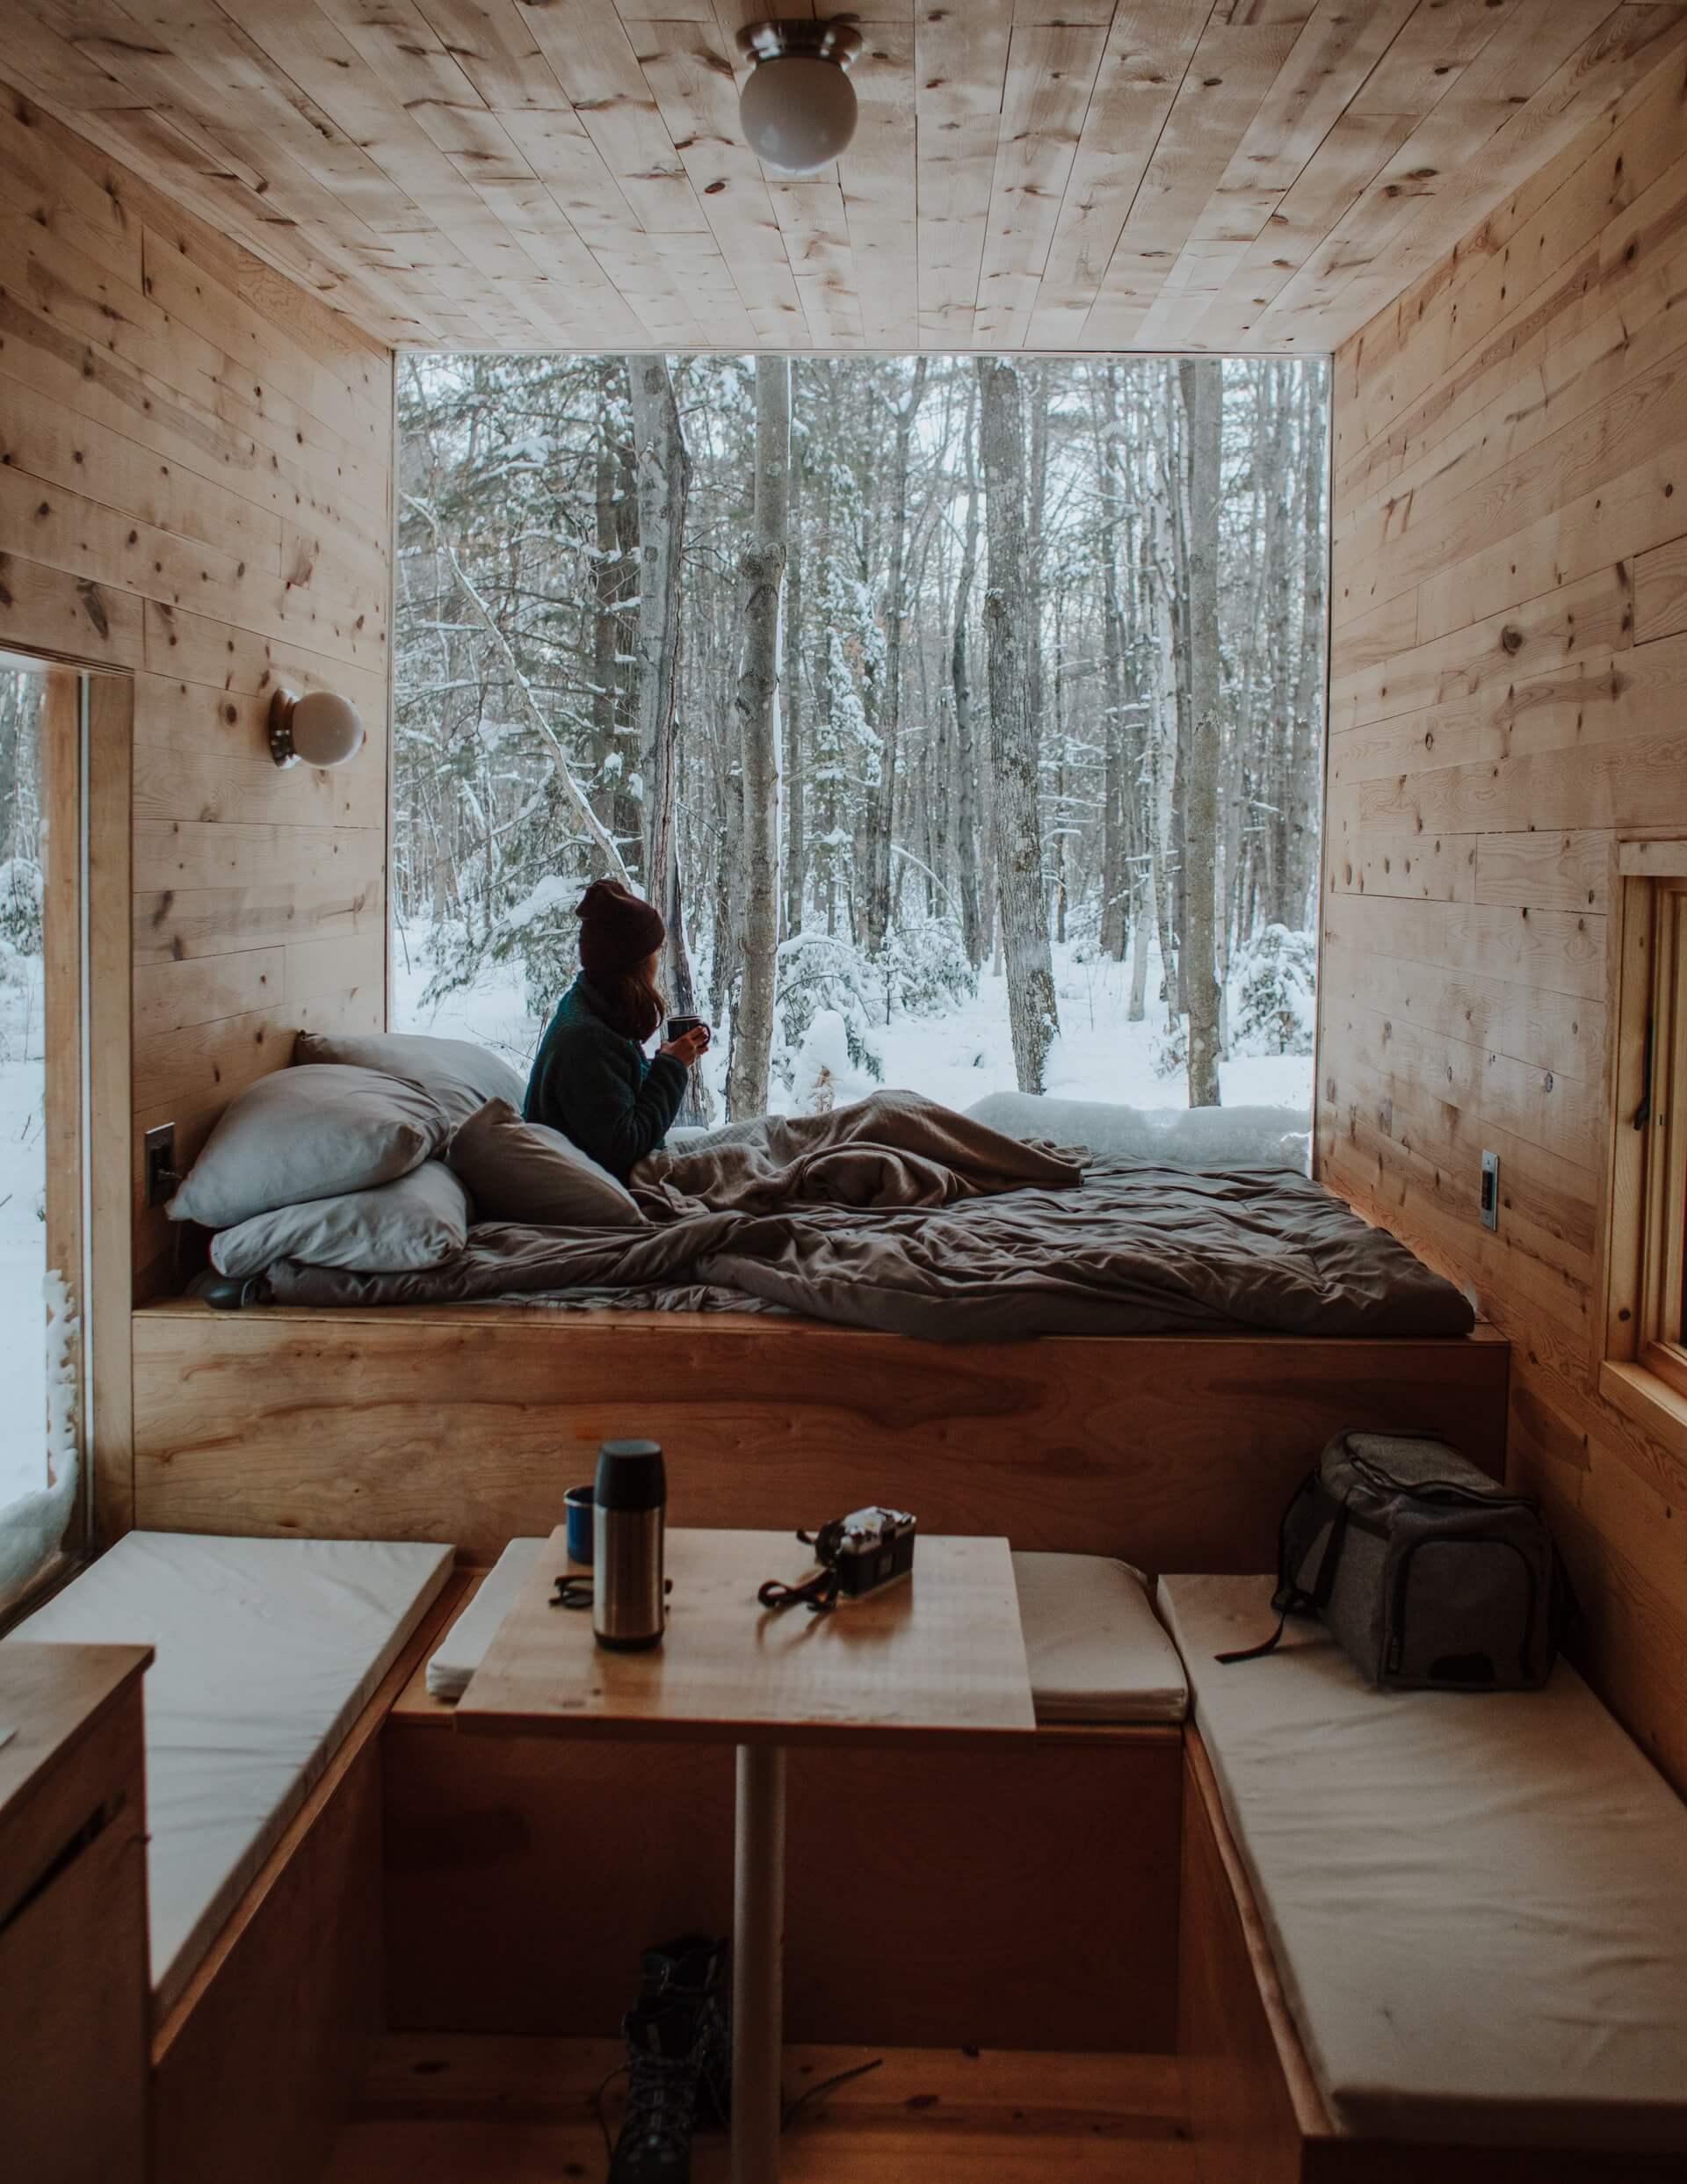 1 Bedroom Cabins in Wears Valley, TN